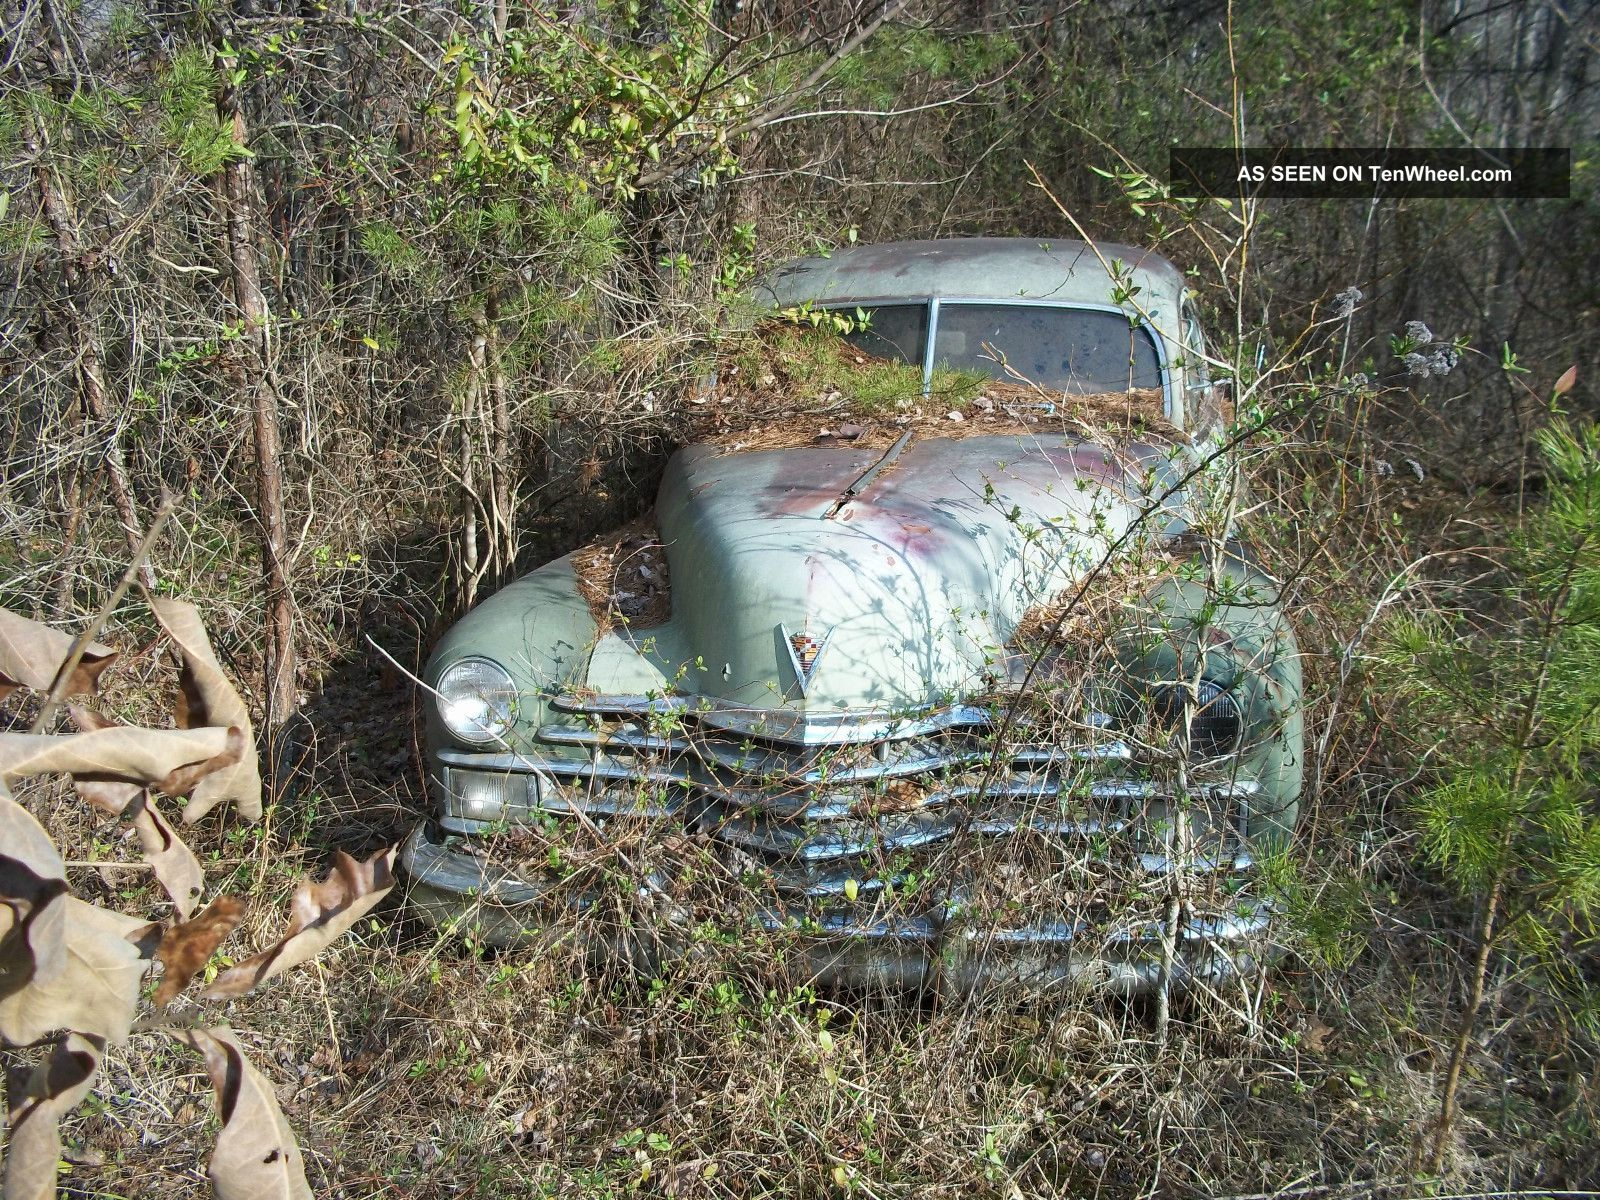 1947 Cadilac 4 Door California Car Complete Other photo